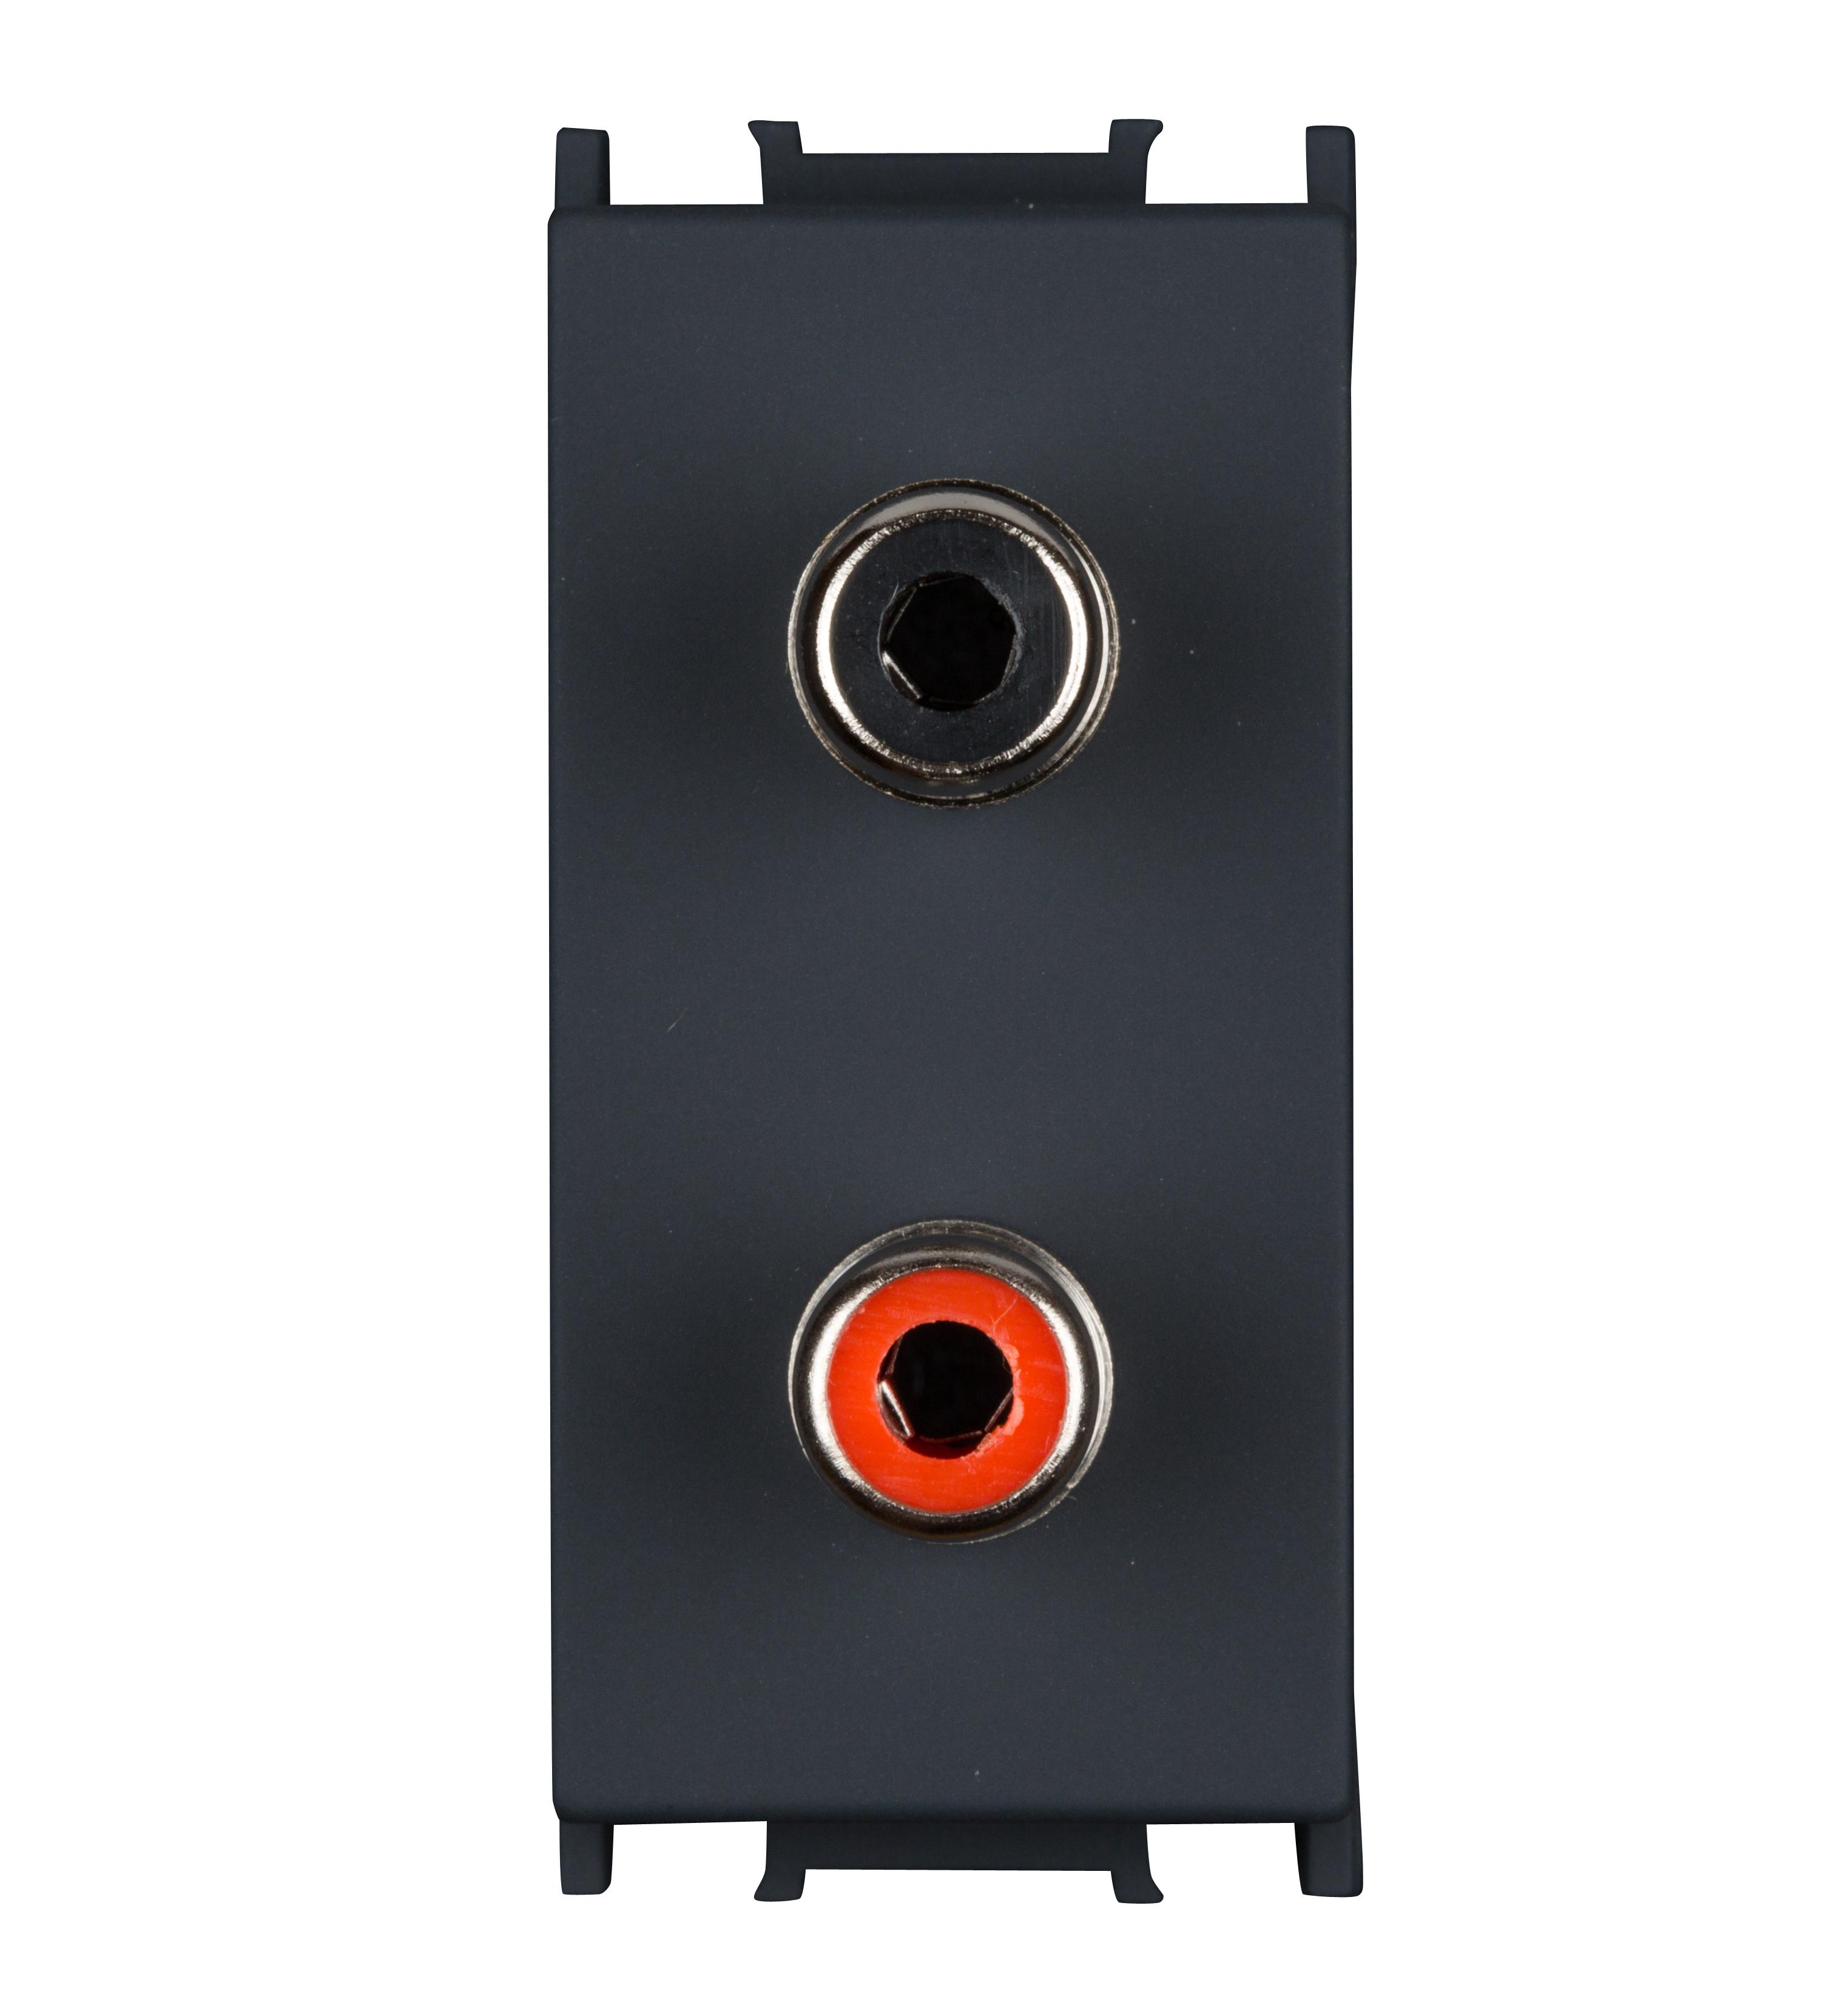 1 Stk Audiosteckdose 1M 2xRCA, schwarz ET114007--